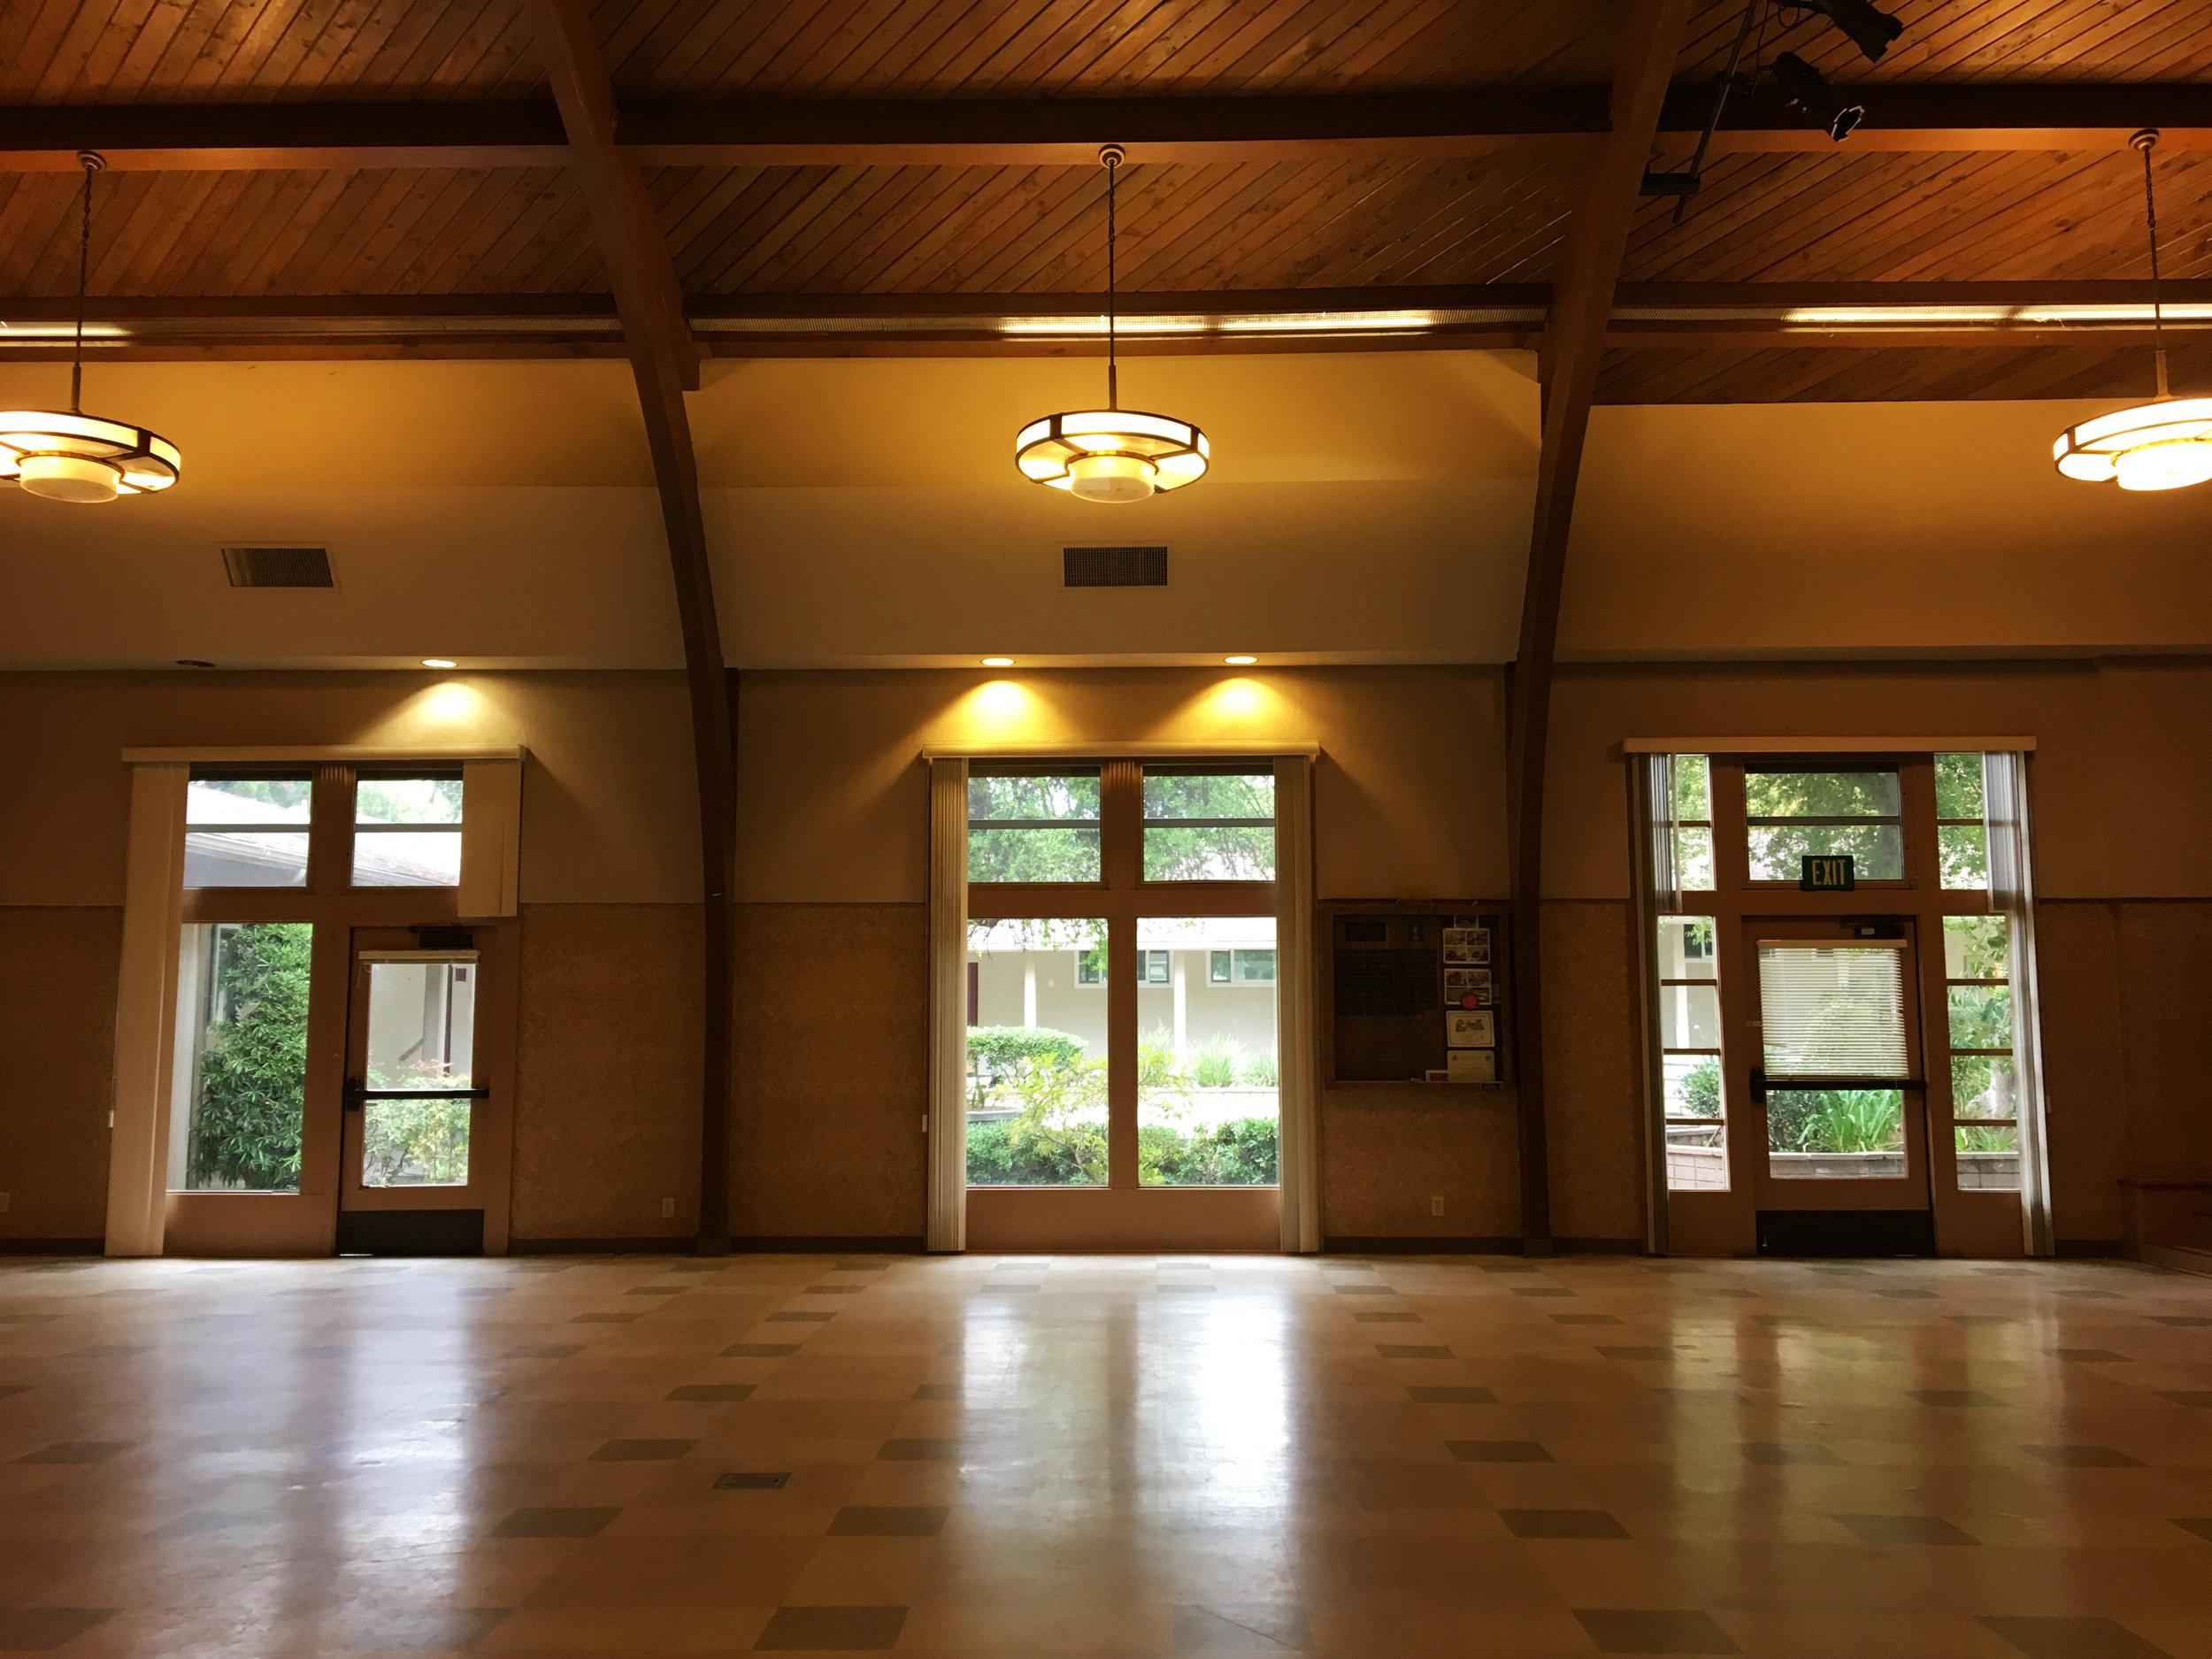 claremont-presbyterian-church-campus-tour-fellowship-hall-3.jpg